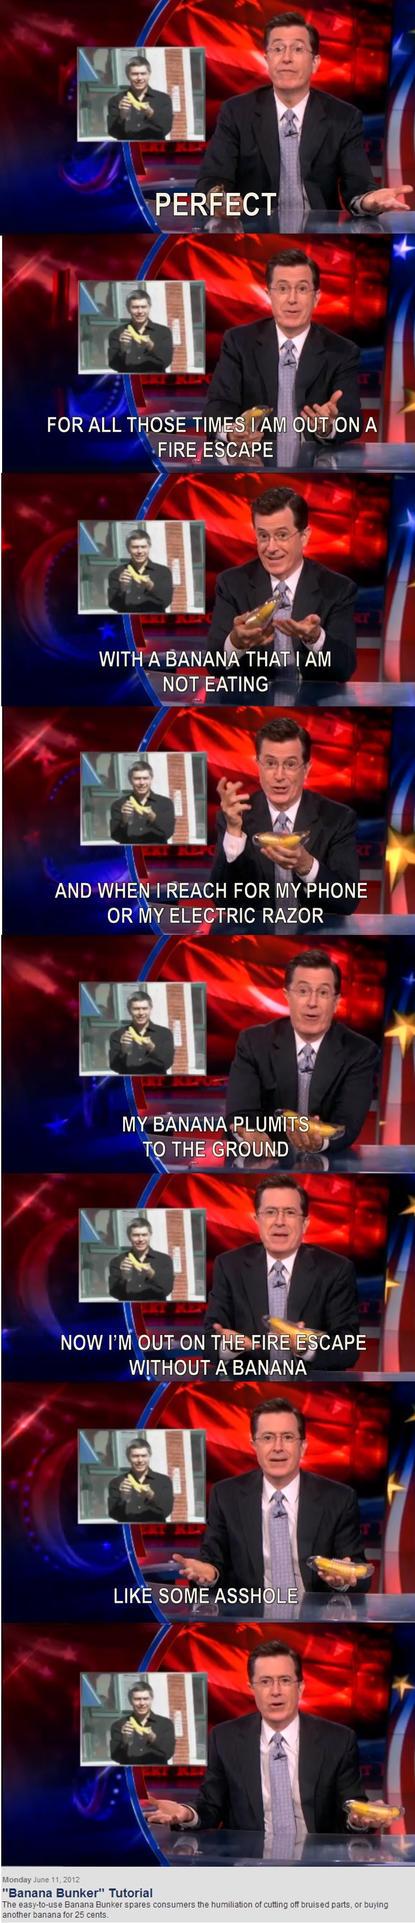 Banana Bunker by twrl11